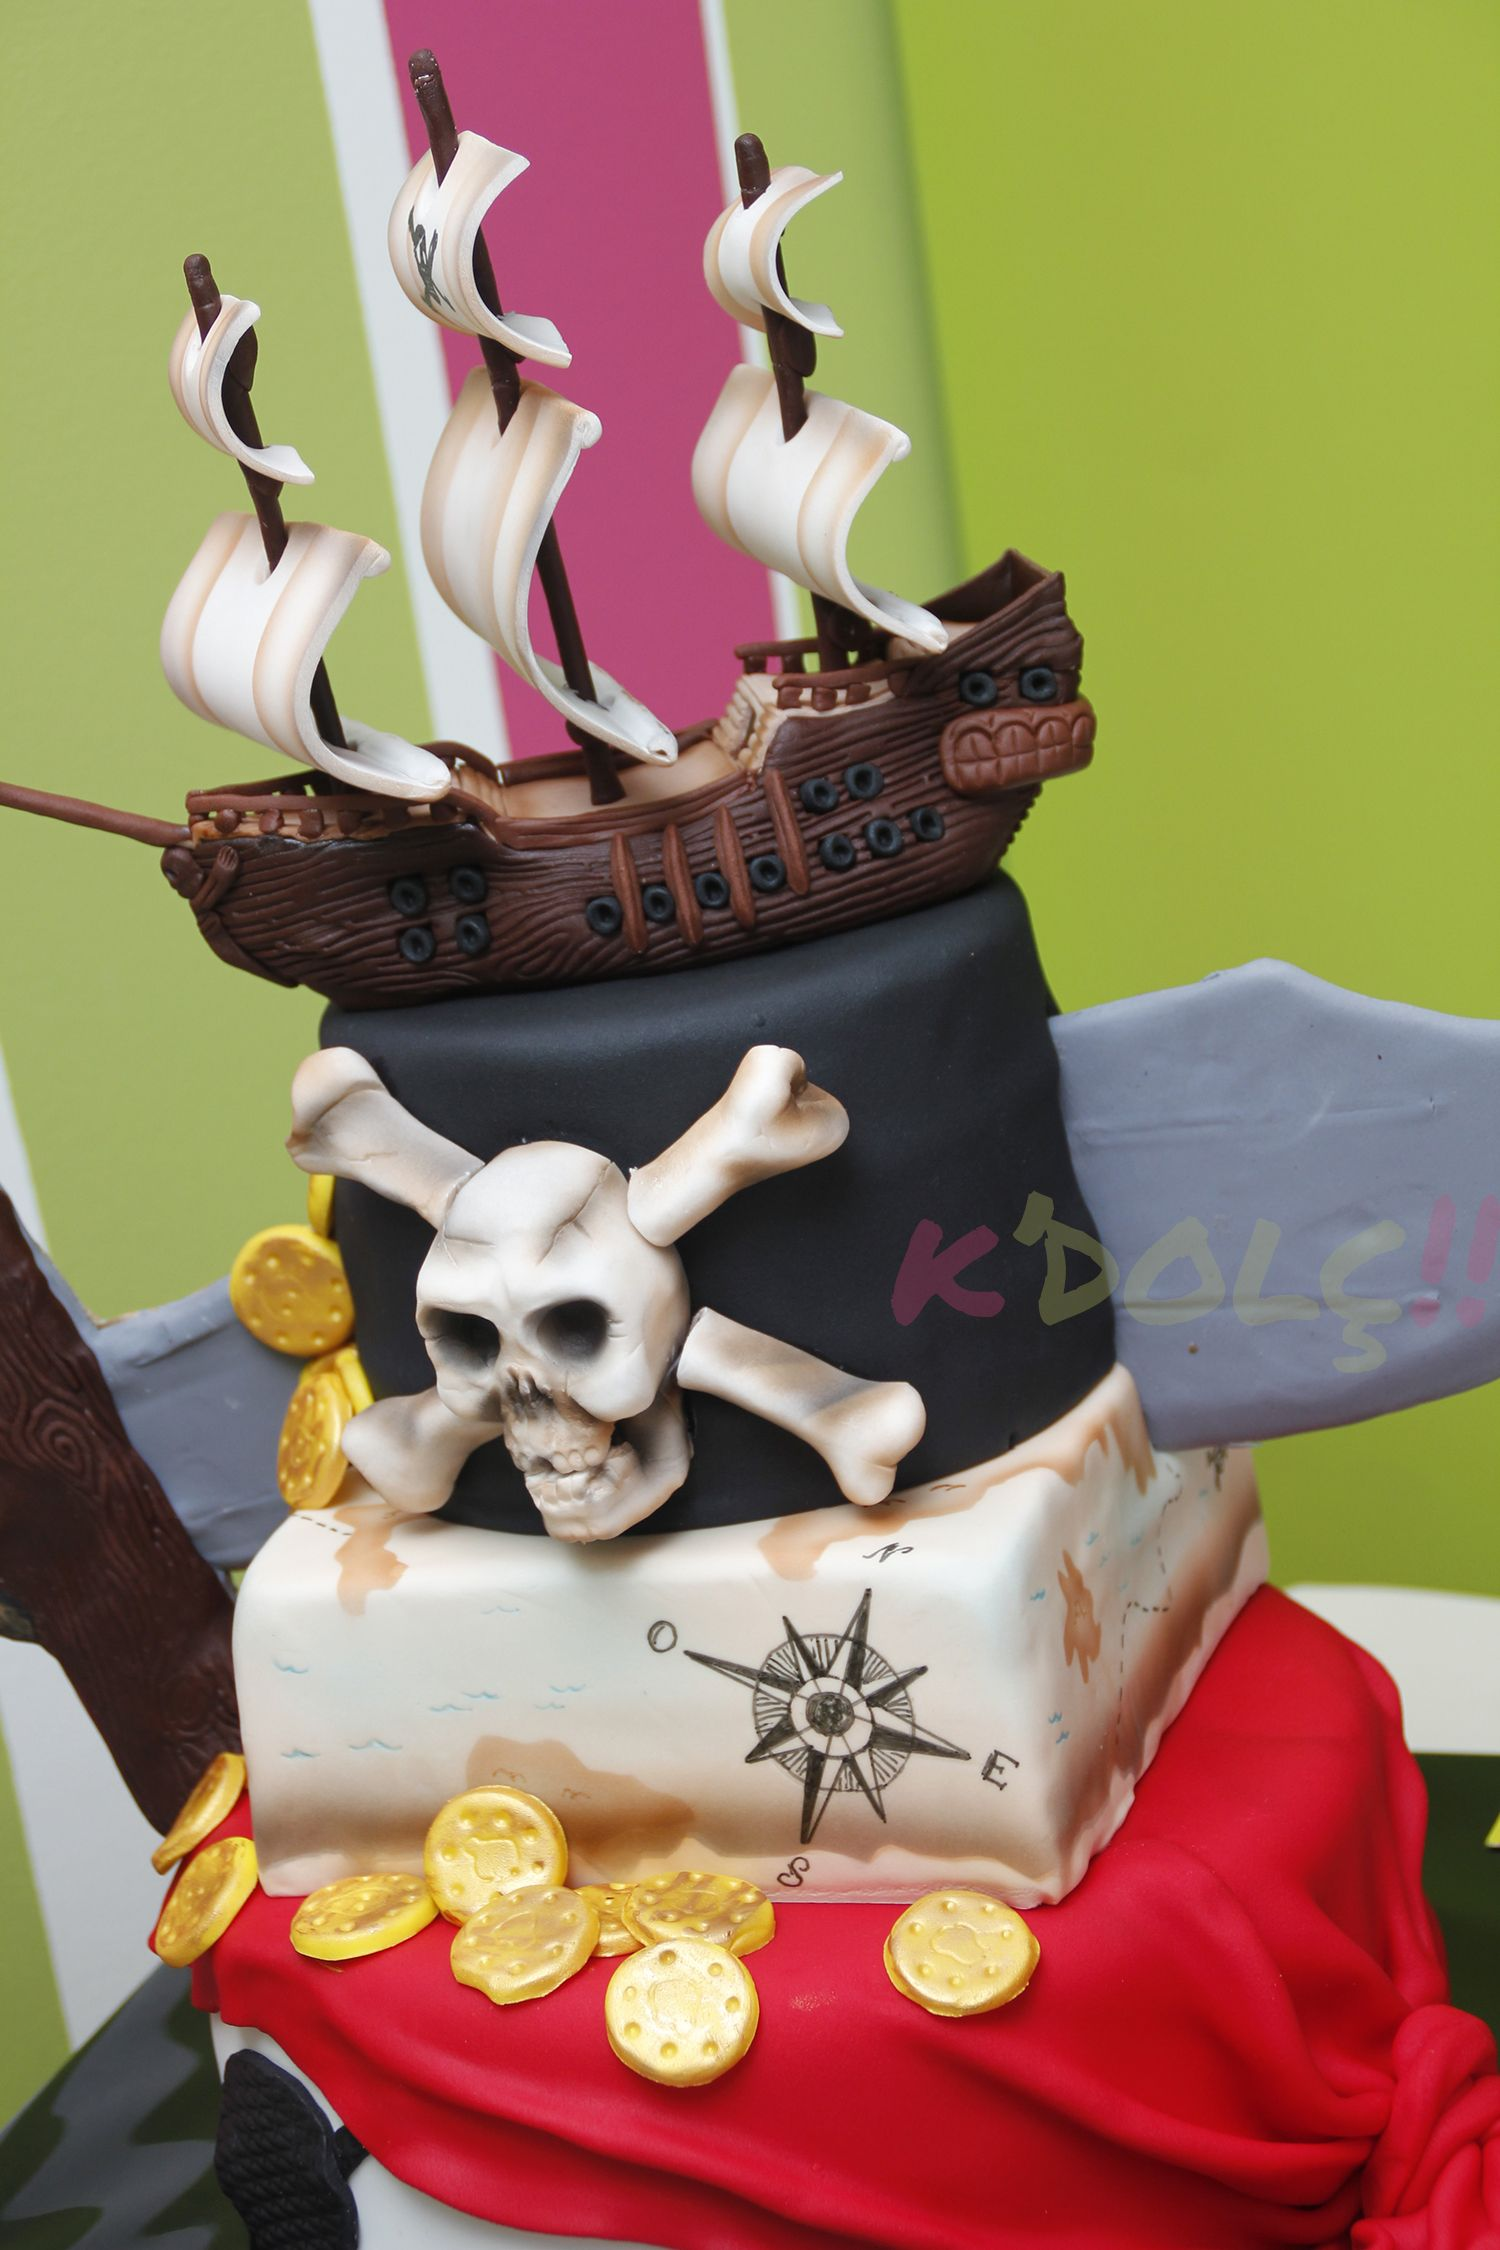 Cake ideas on pinterest pirate cakes marshmallow fondant and - Zoom Tarta Barco Pirata Fondant Pirate Cakespirate Treasurecupcake